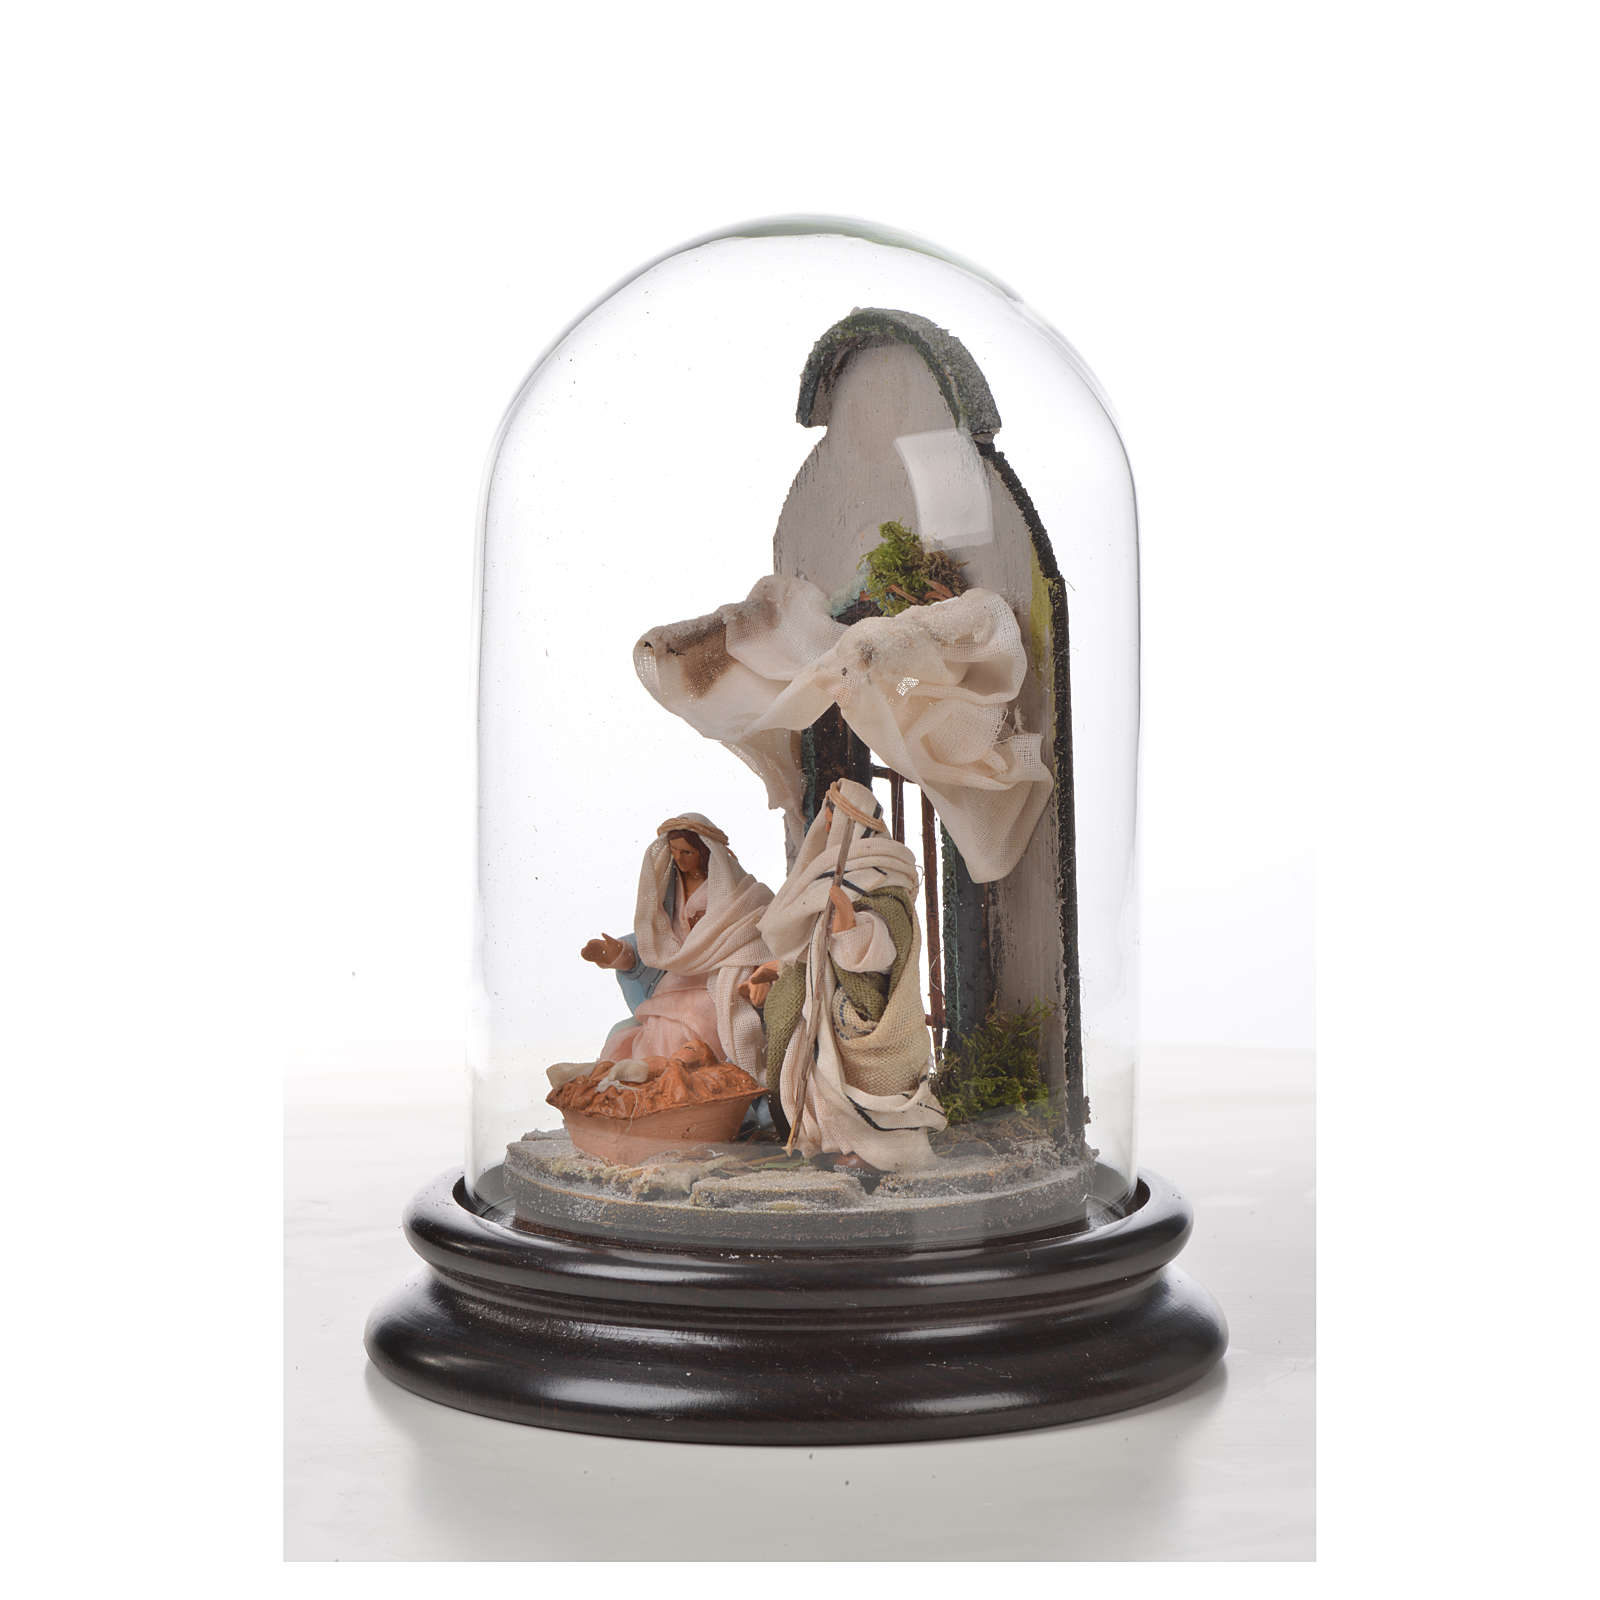 Neapolitan Nativity, Arabian style in glass dome 11x16cm 4